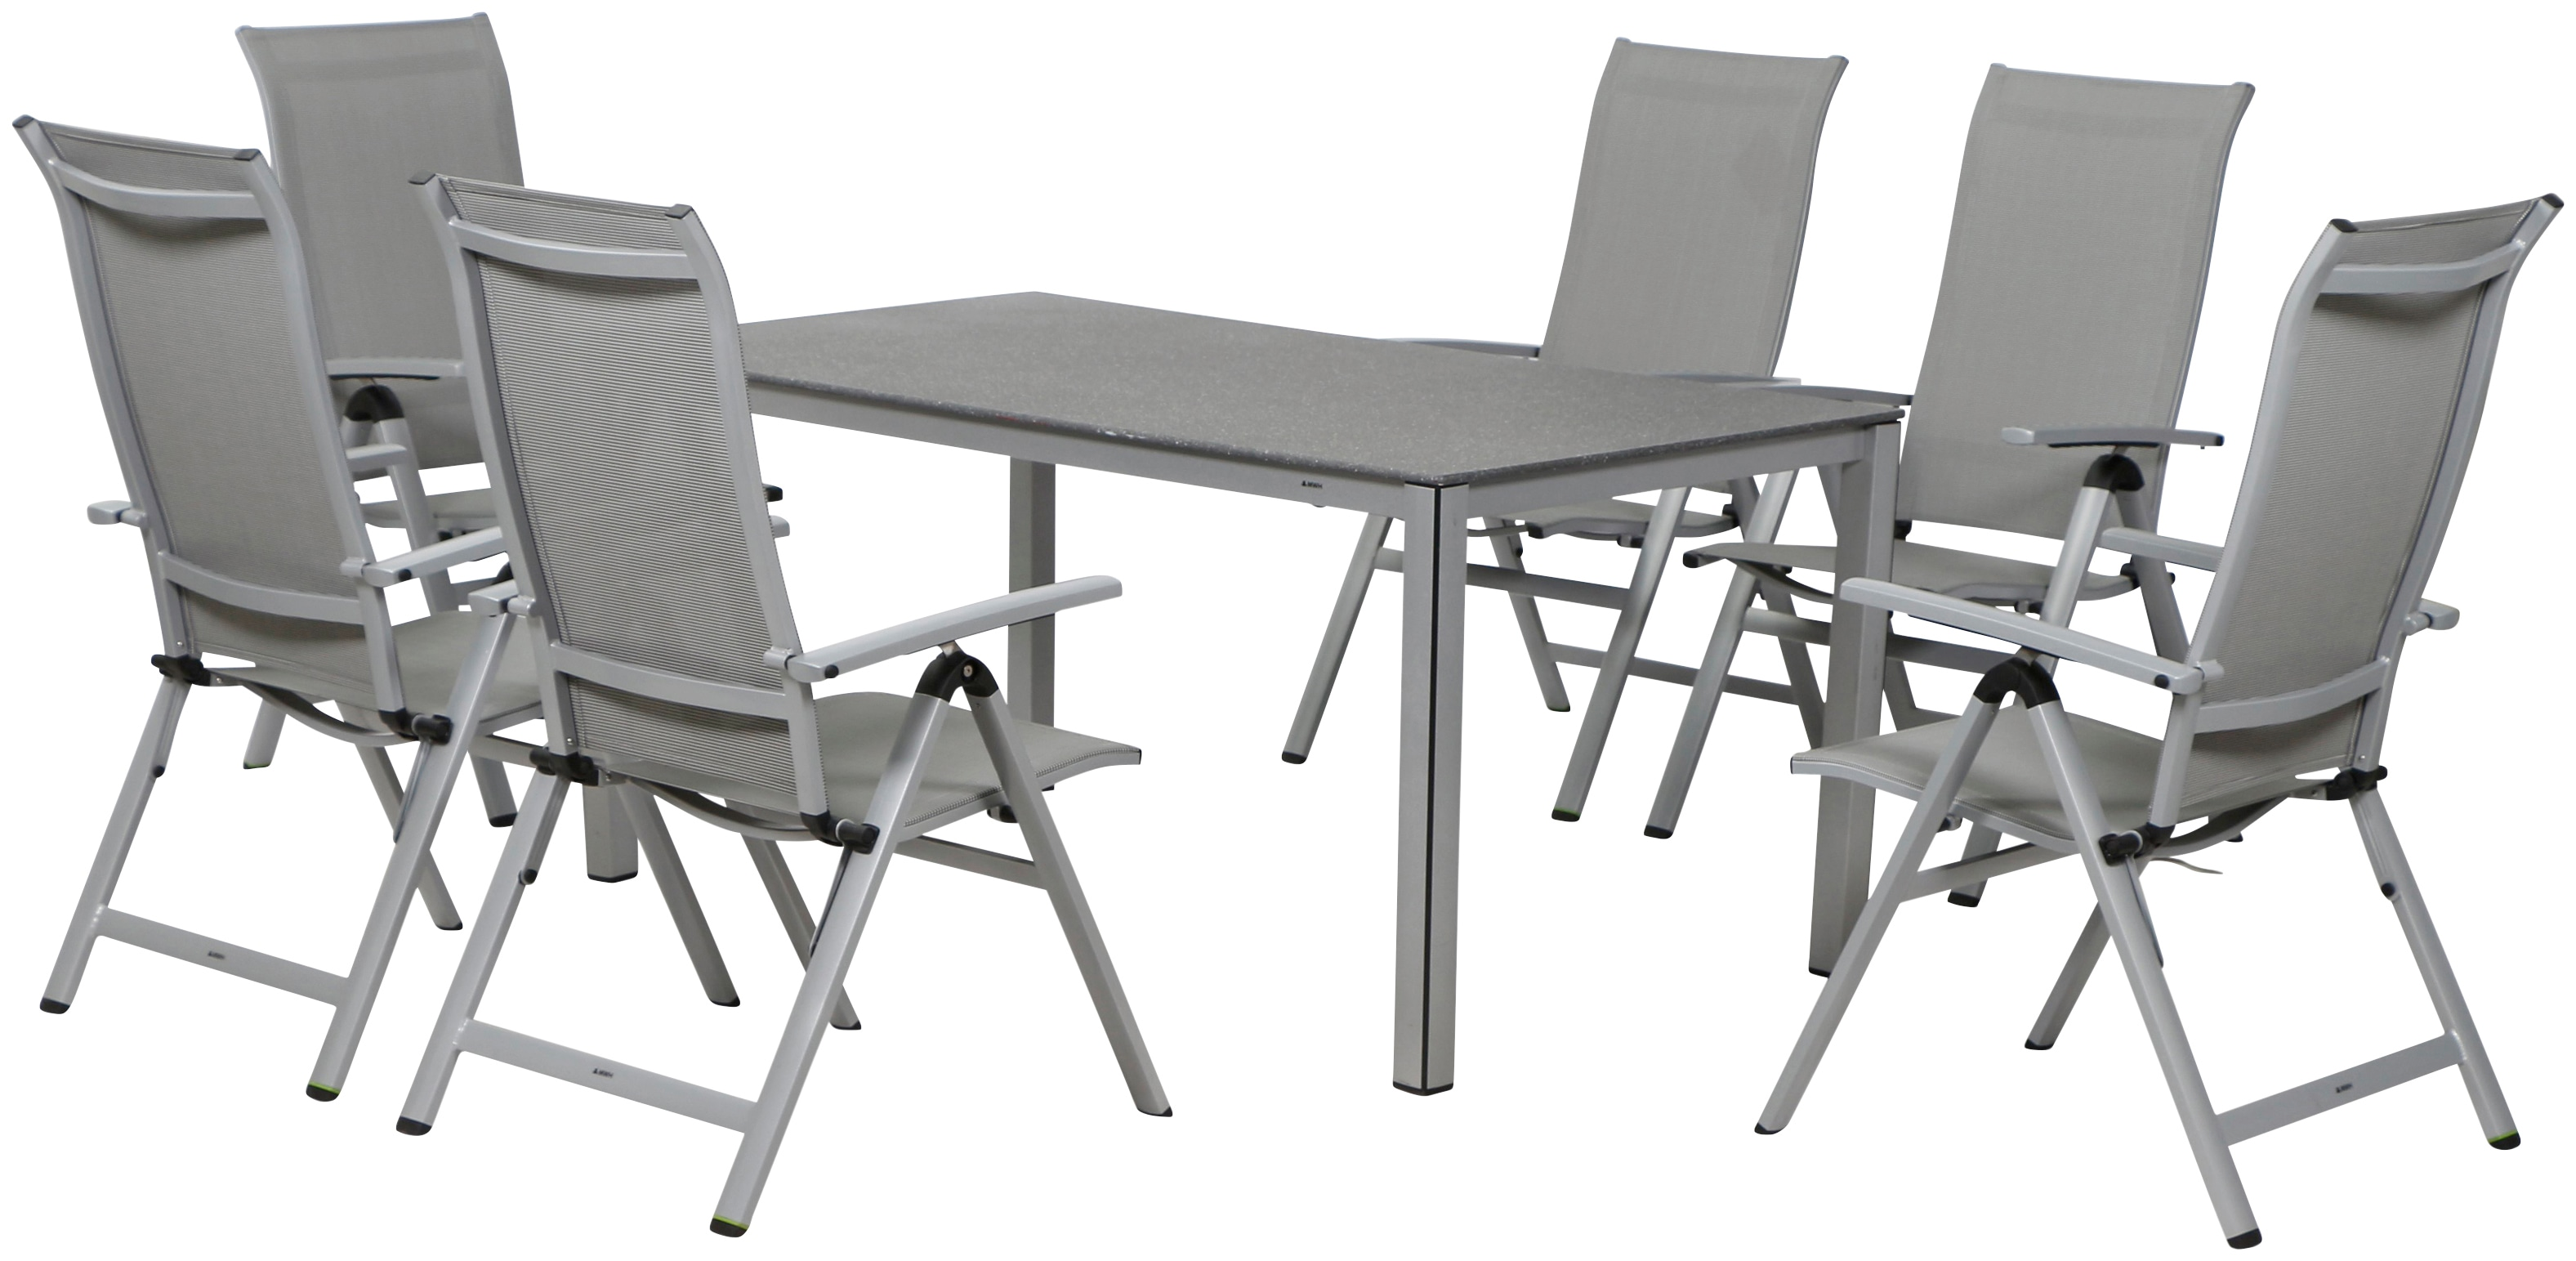 MWH Gartenmöbelset Fabulo 5tlg 4 Sessel Tisch 160x90 cm Aluminium